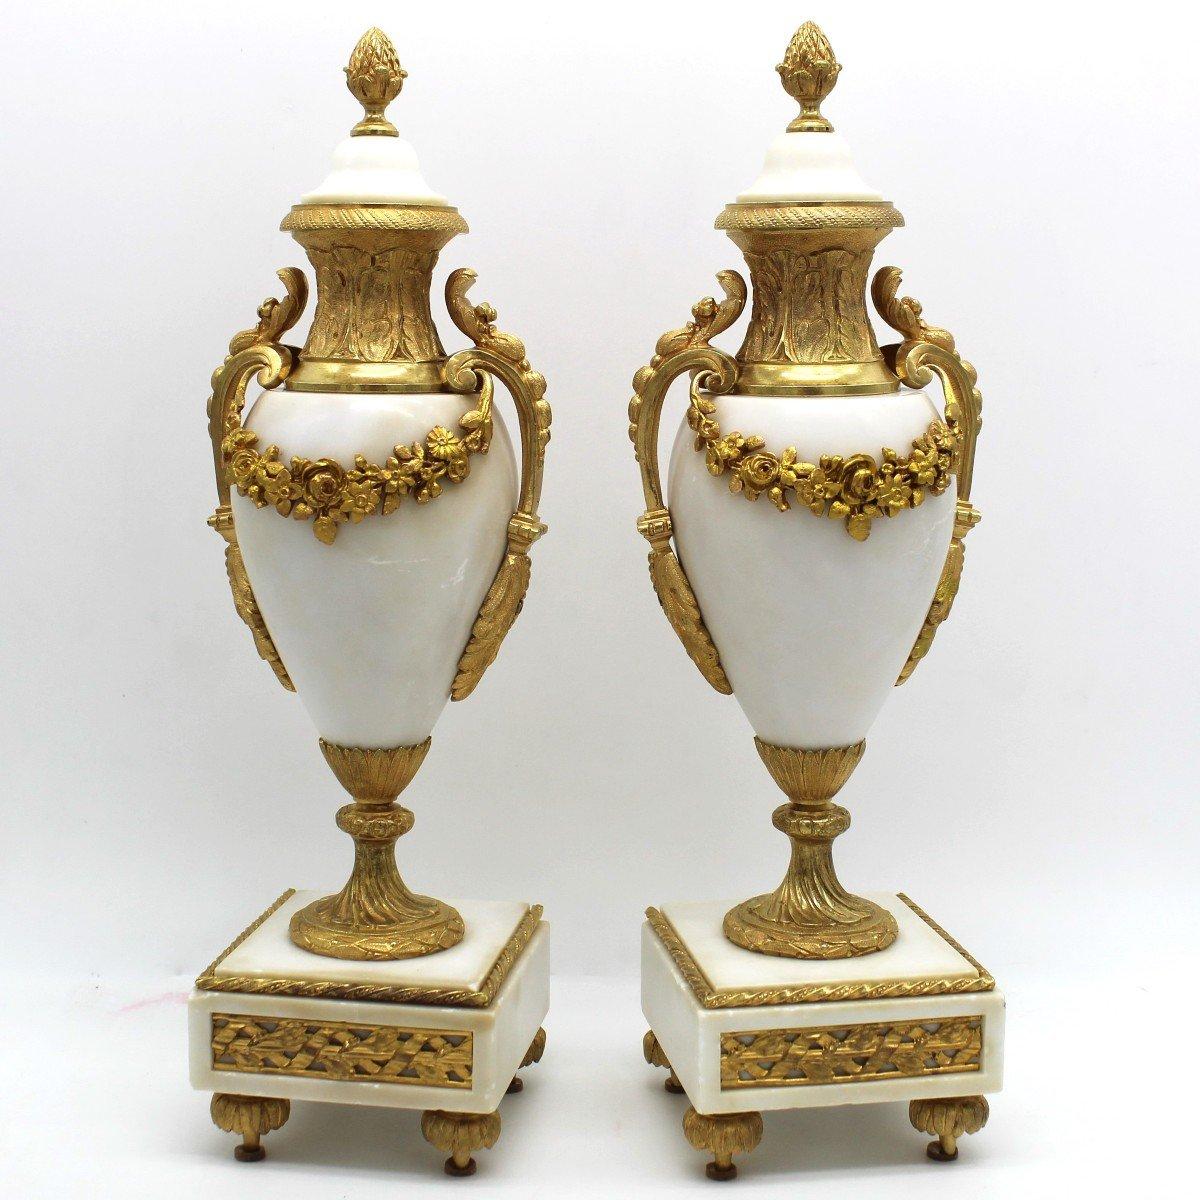 Antique Pair Of Napoleon III Cassolette Vases In Gilt Bronze - 19th-photo-3